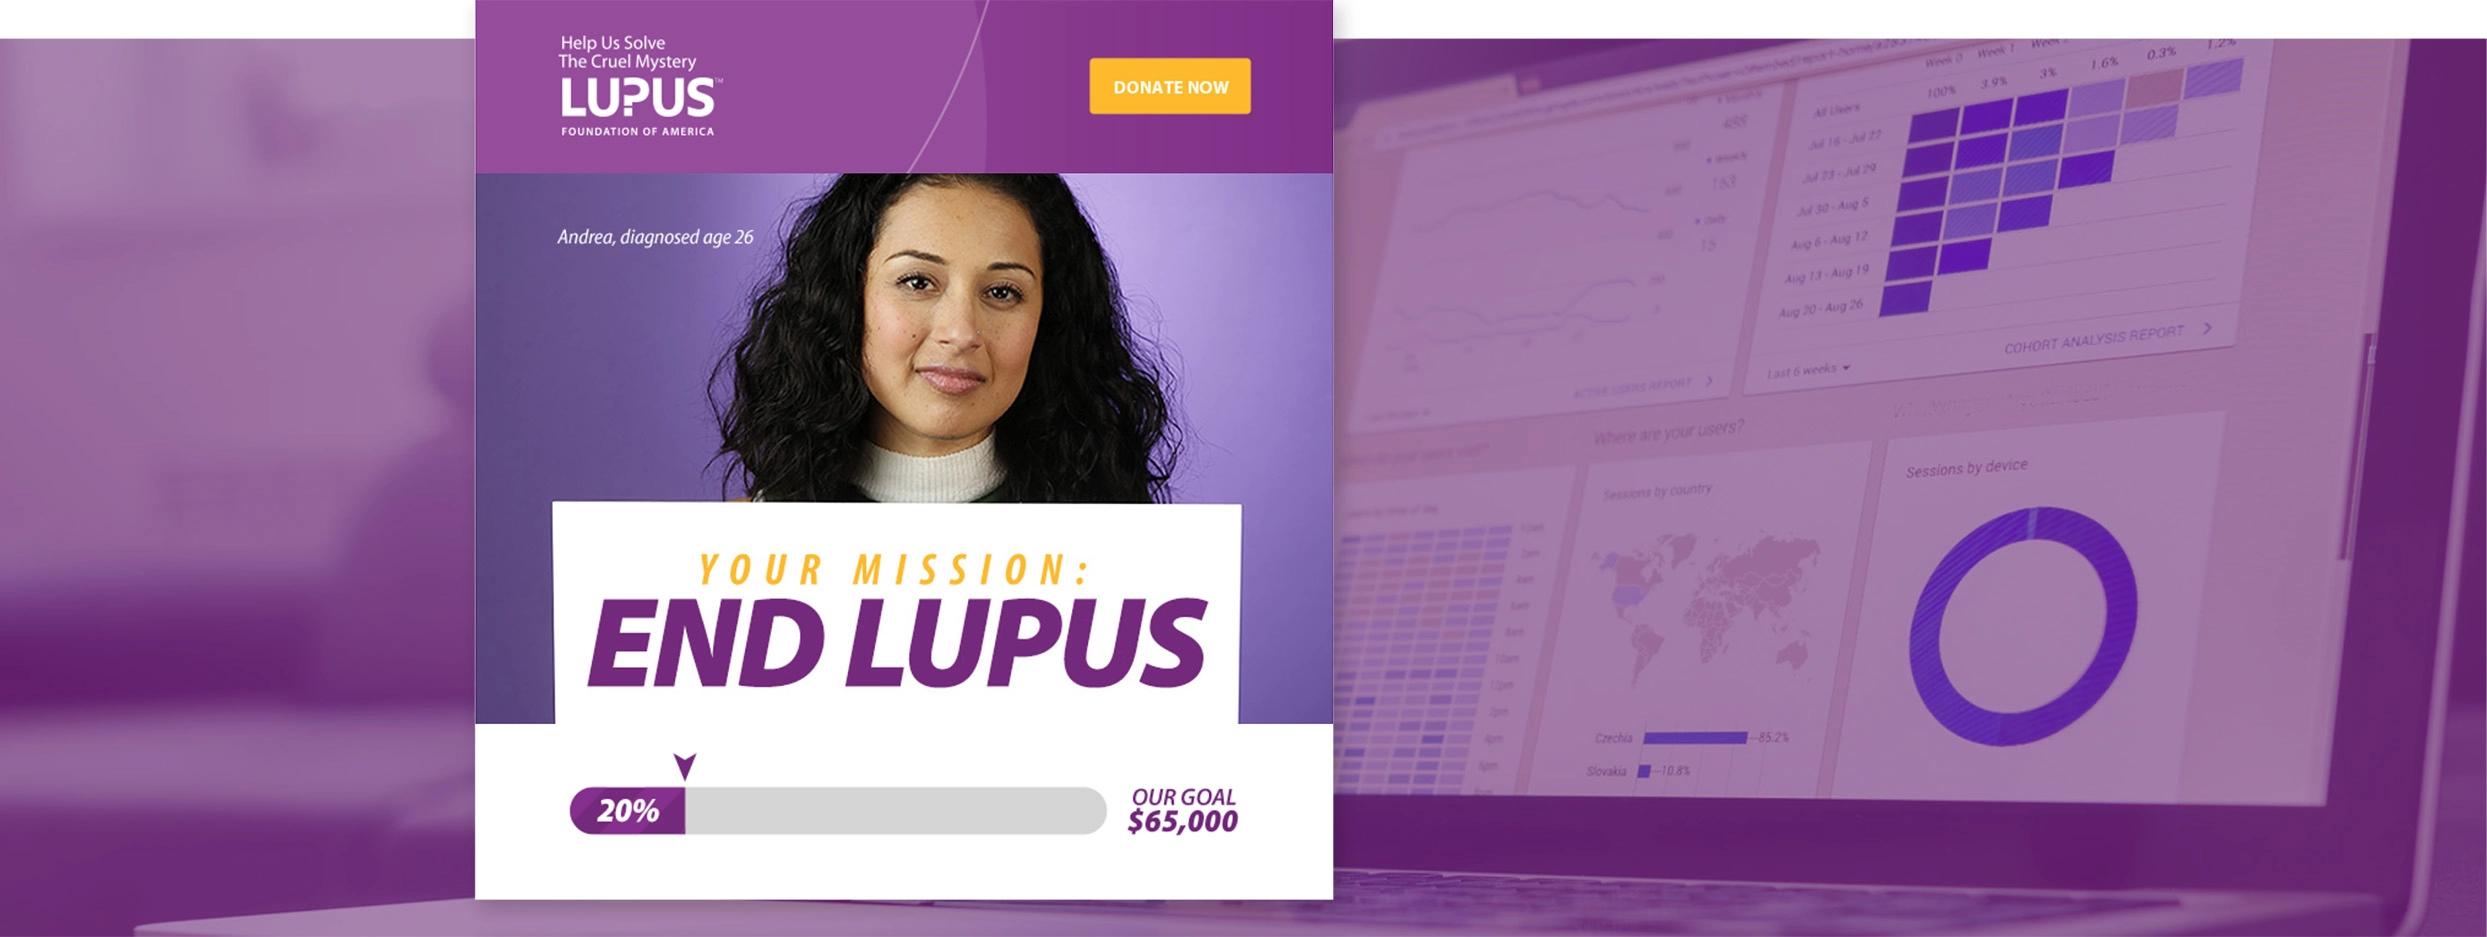 Lupus image panel 1